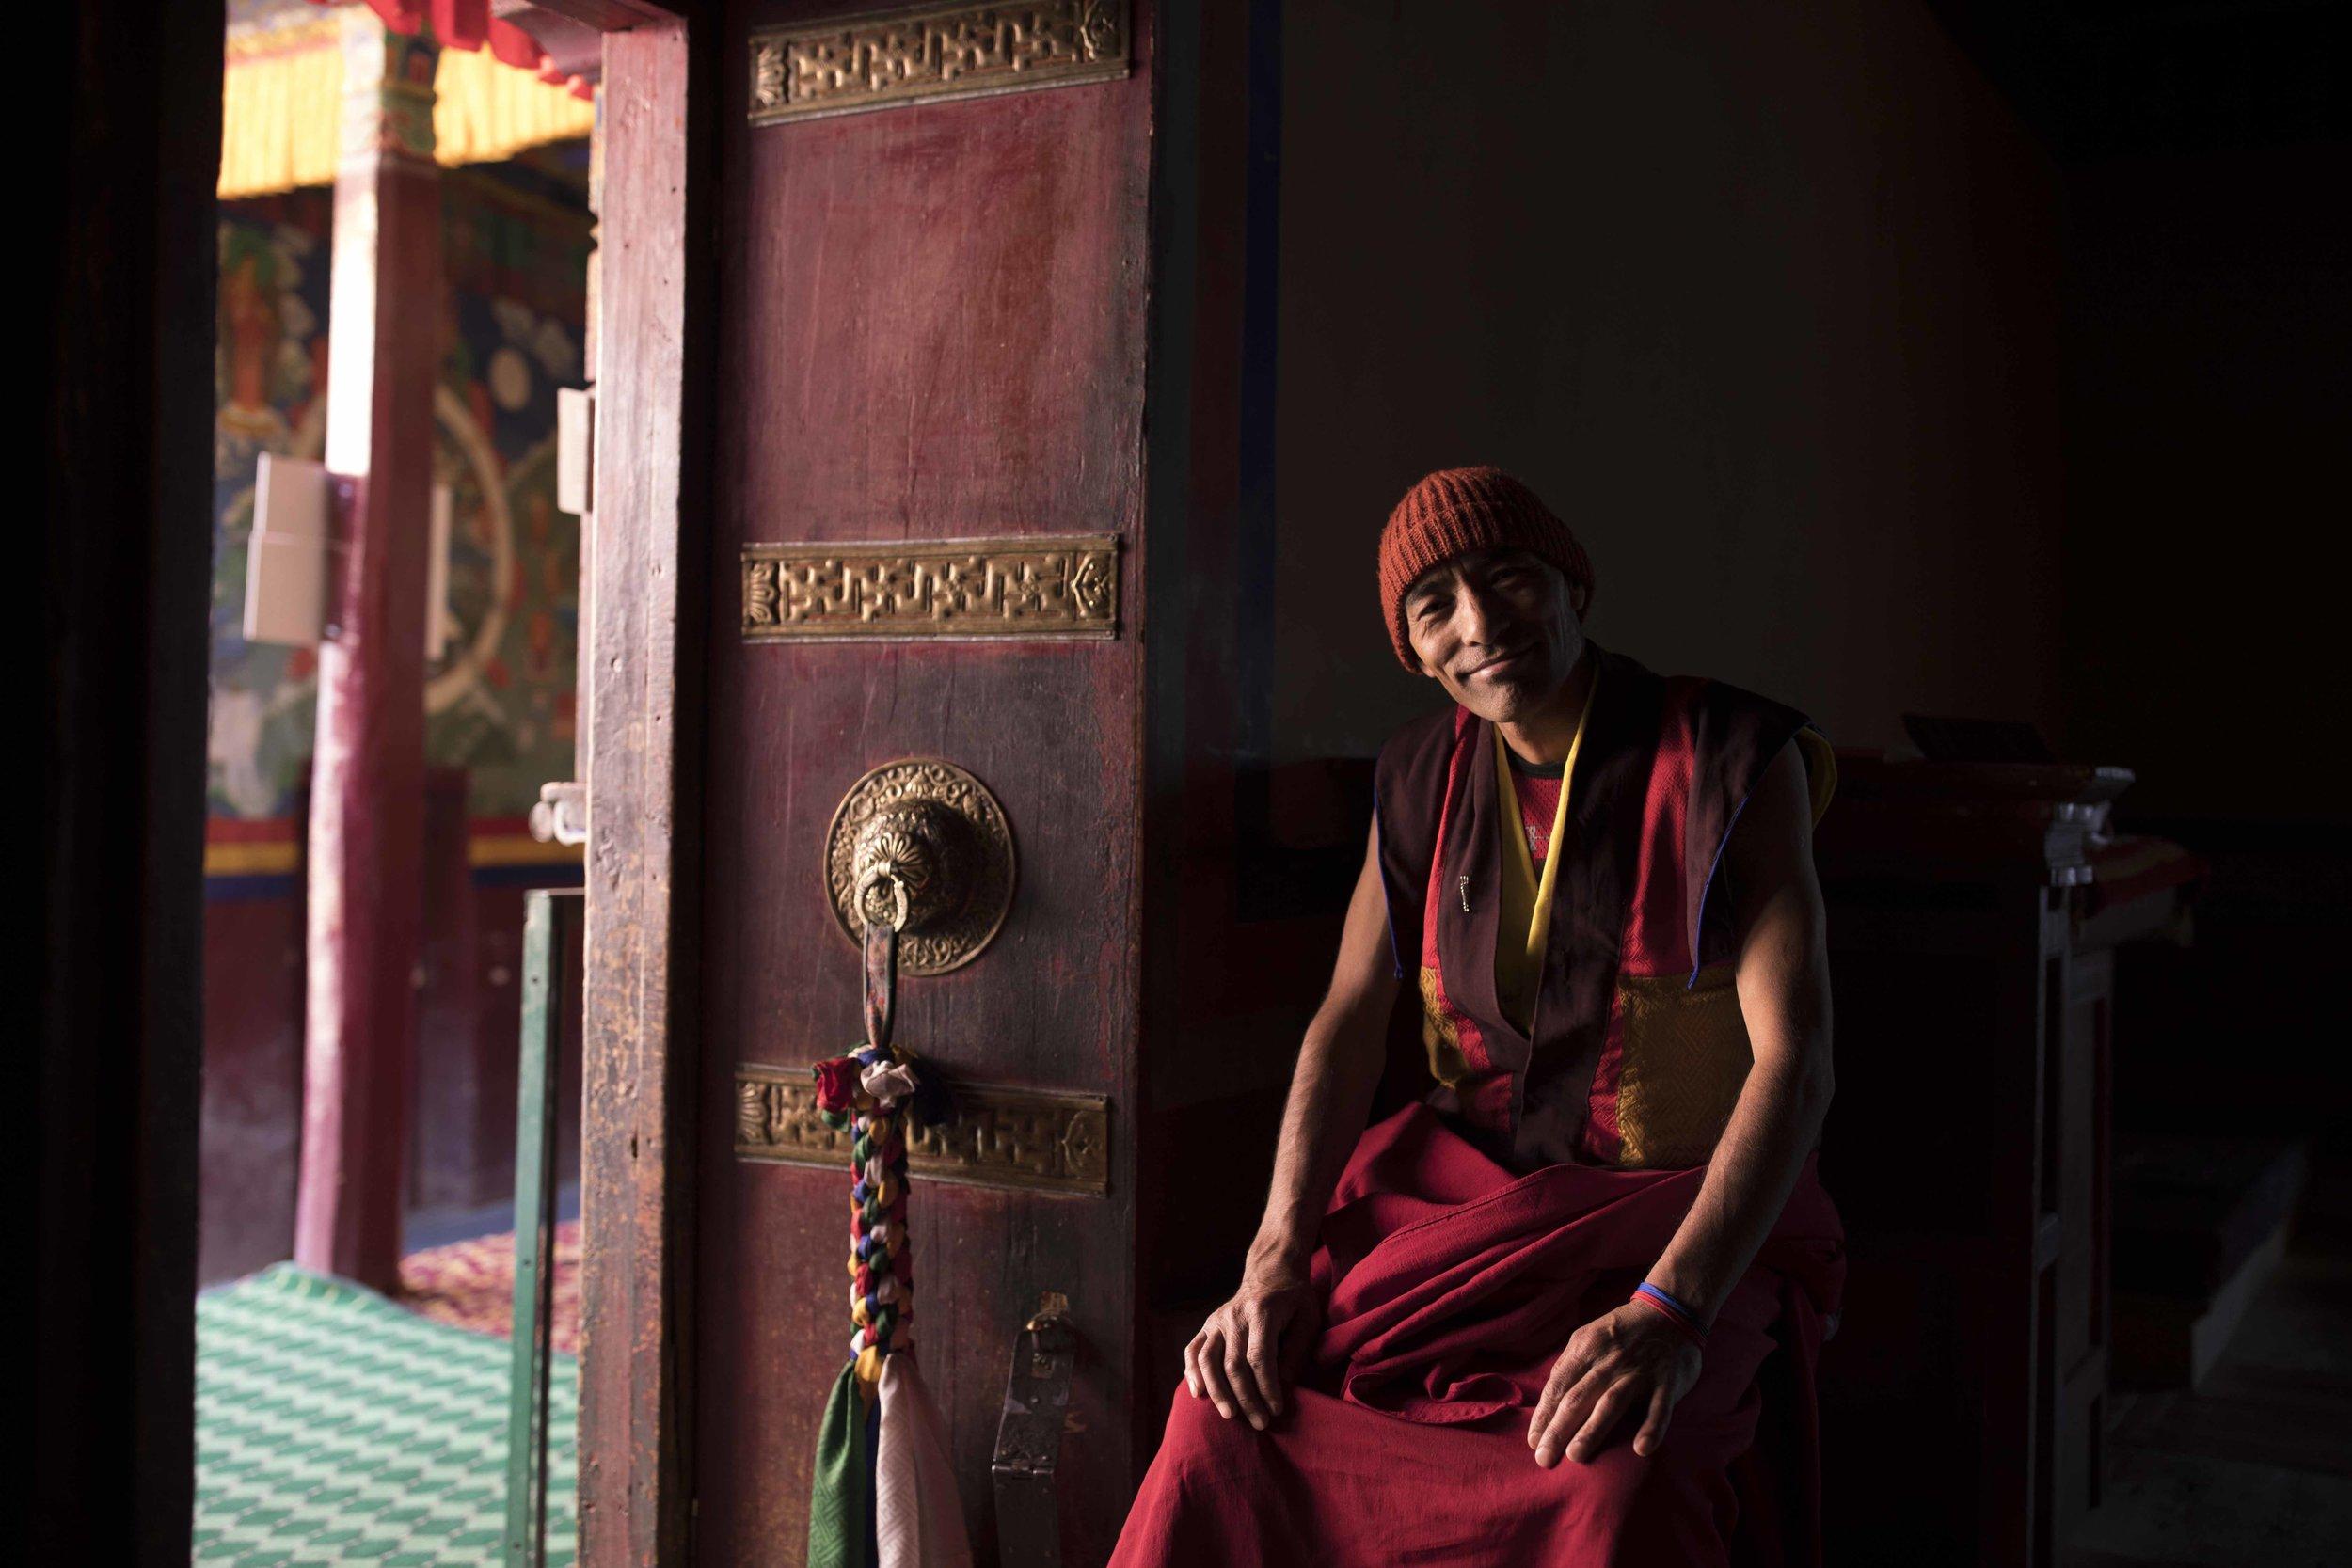 Monk, Yuru gompa, Lamayuru, India